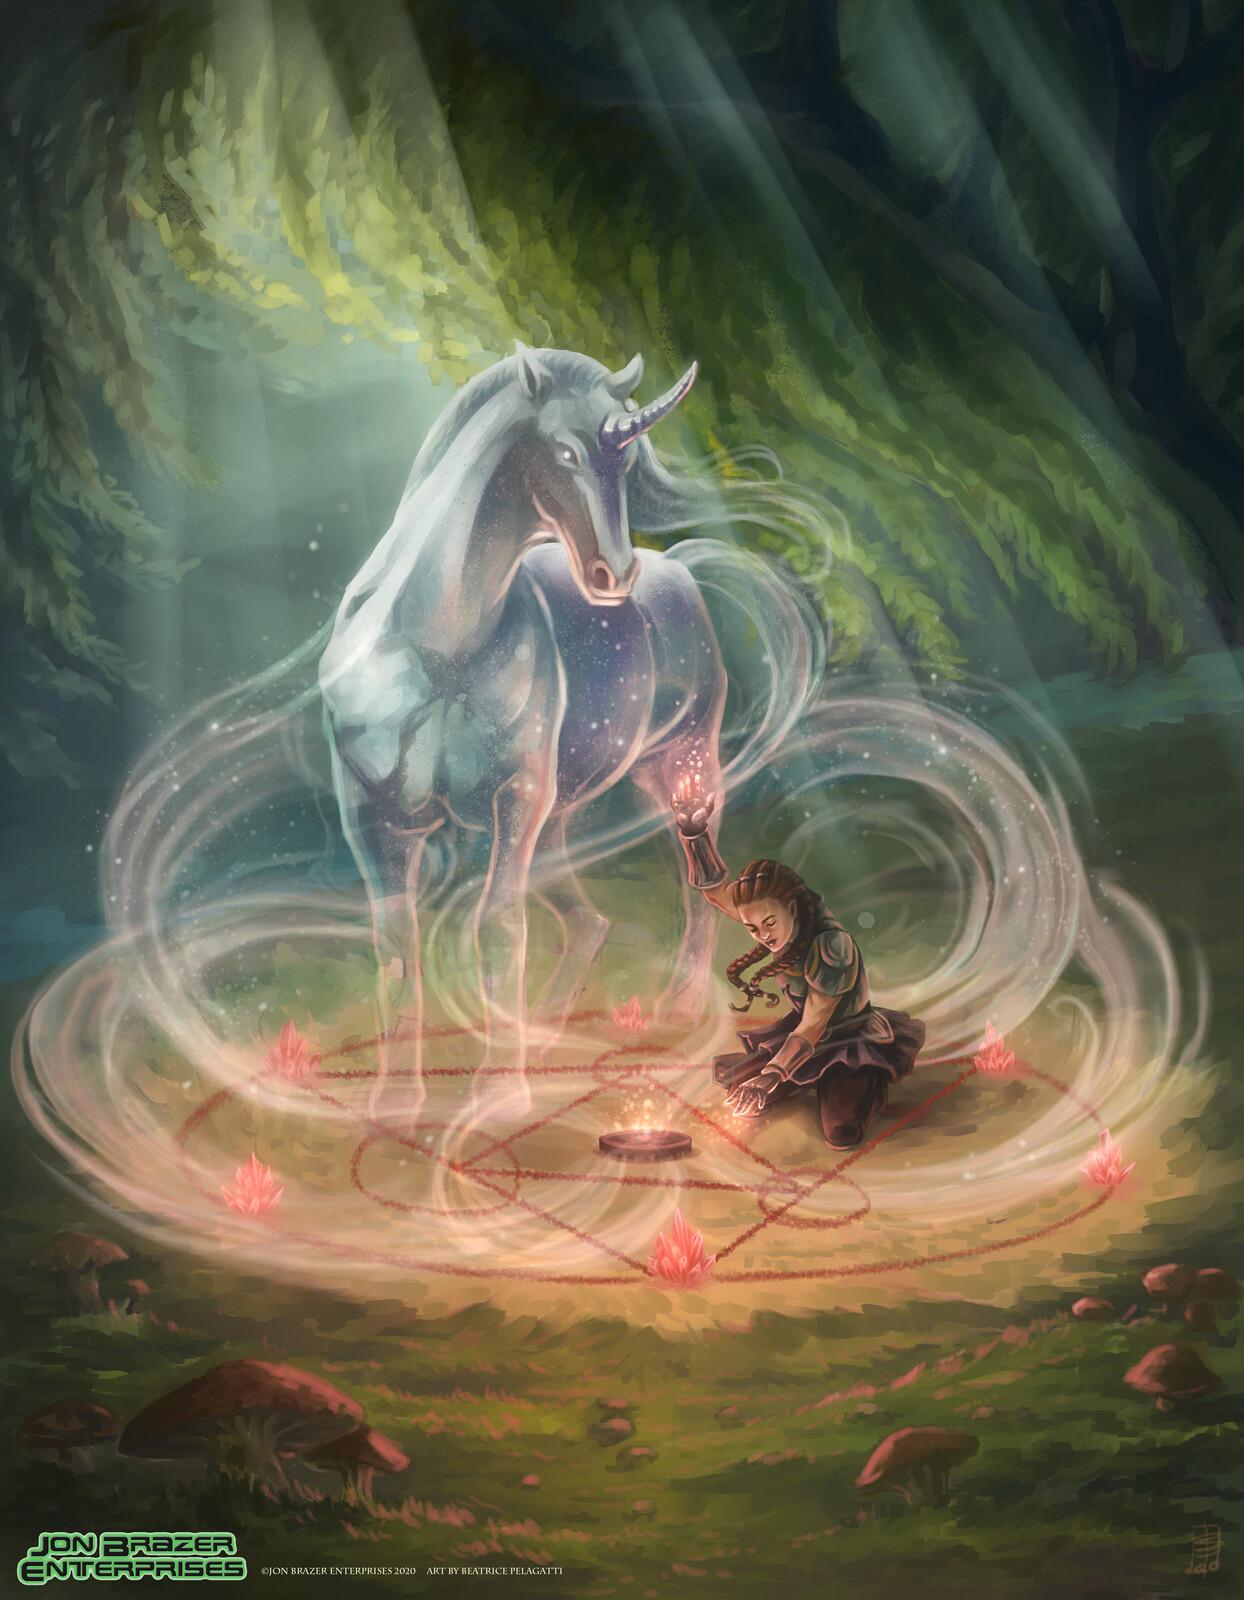 Conjured Creatures